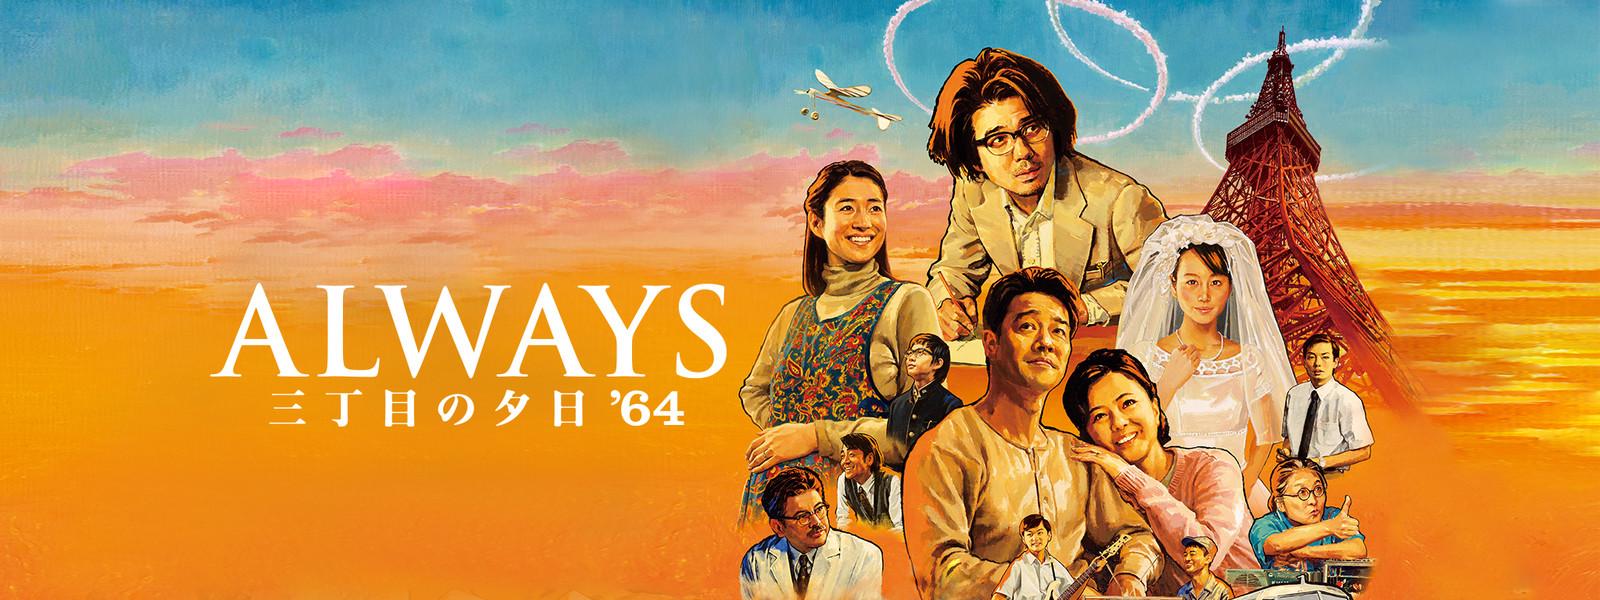 ALWAYS 三丁目の夕日'64(映画)画像